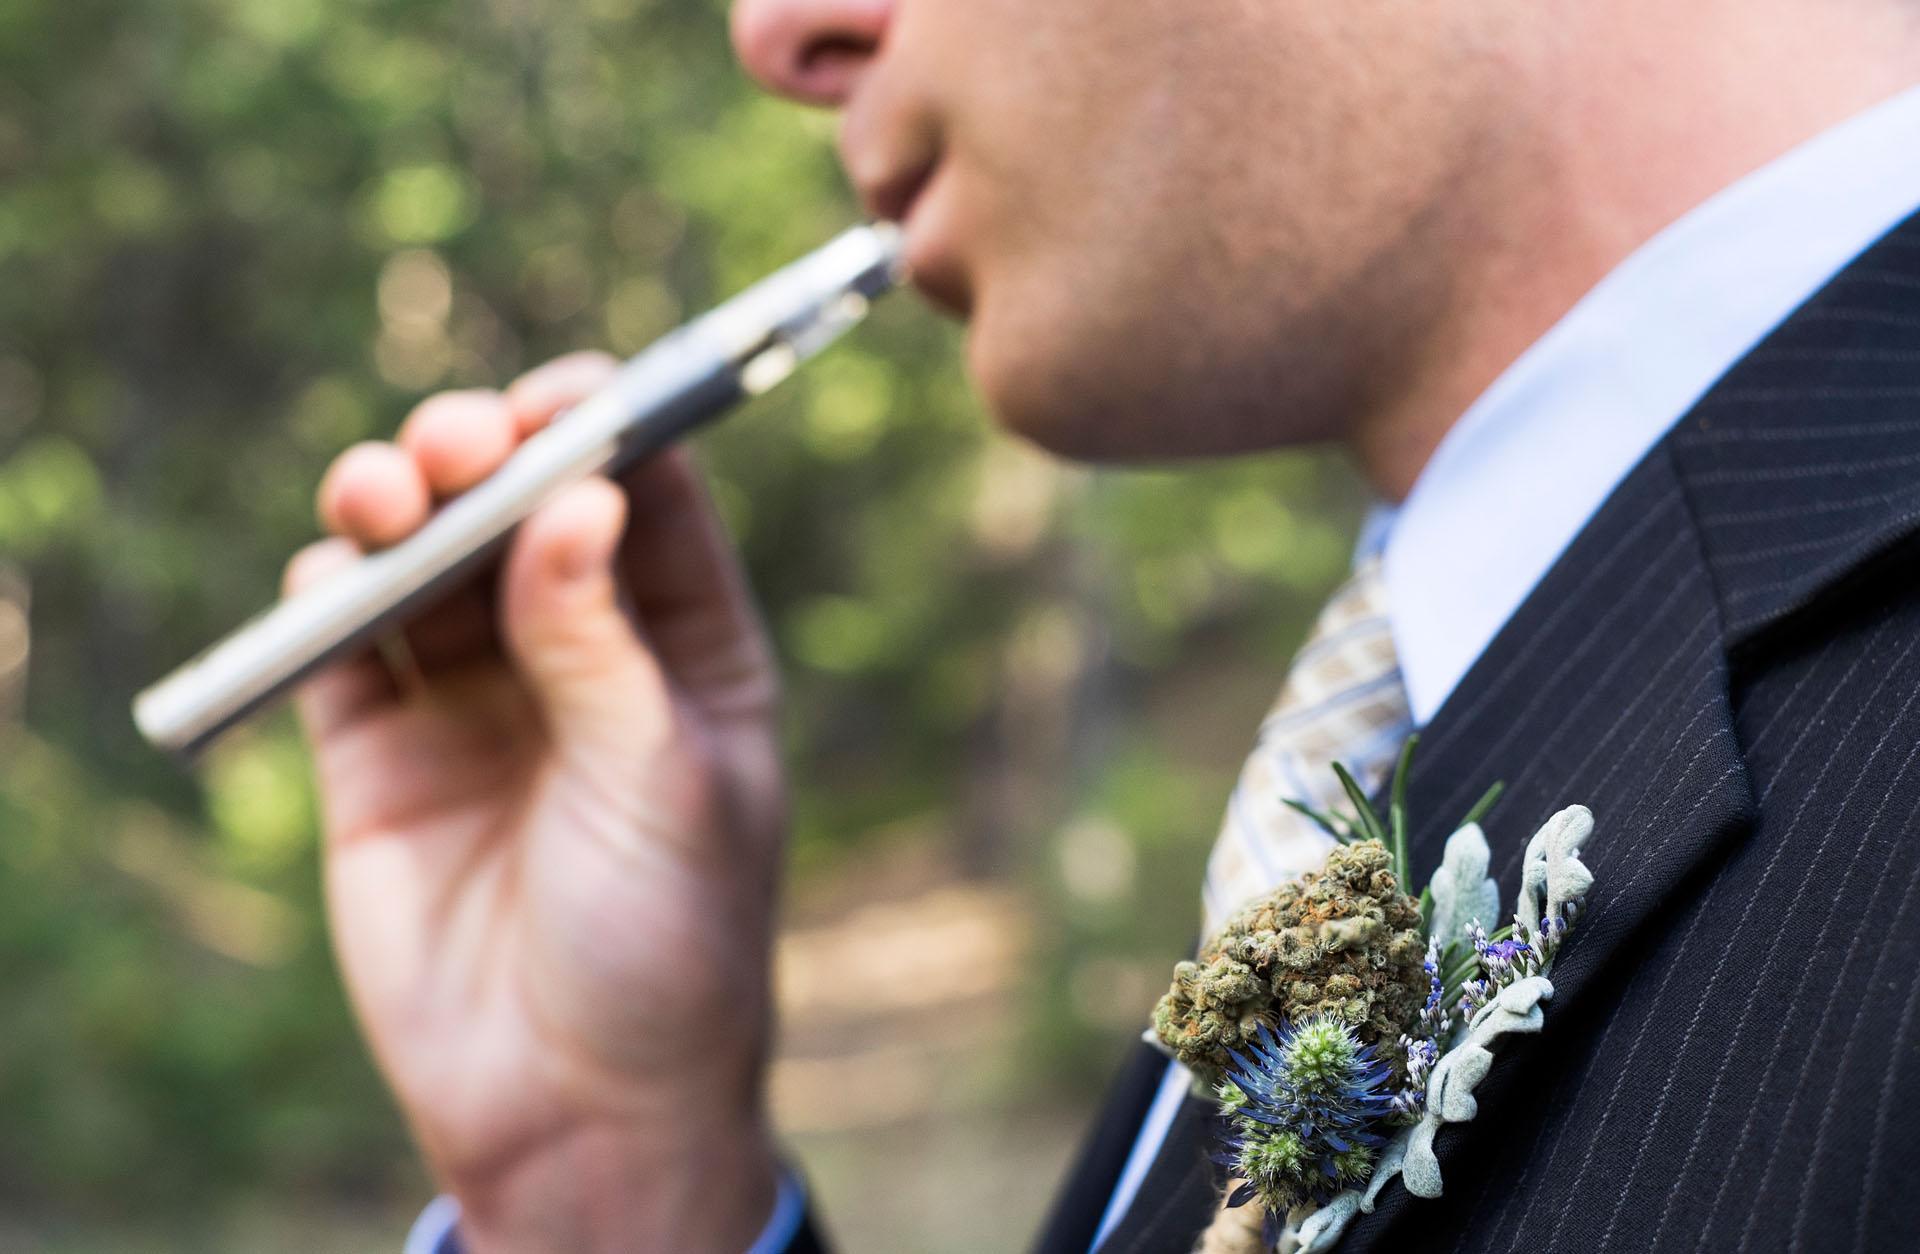 20150528_Lollylah-Cannabis-012